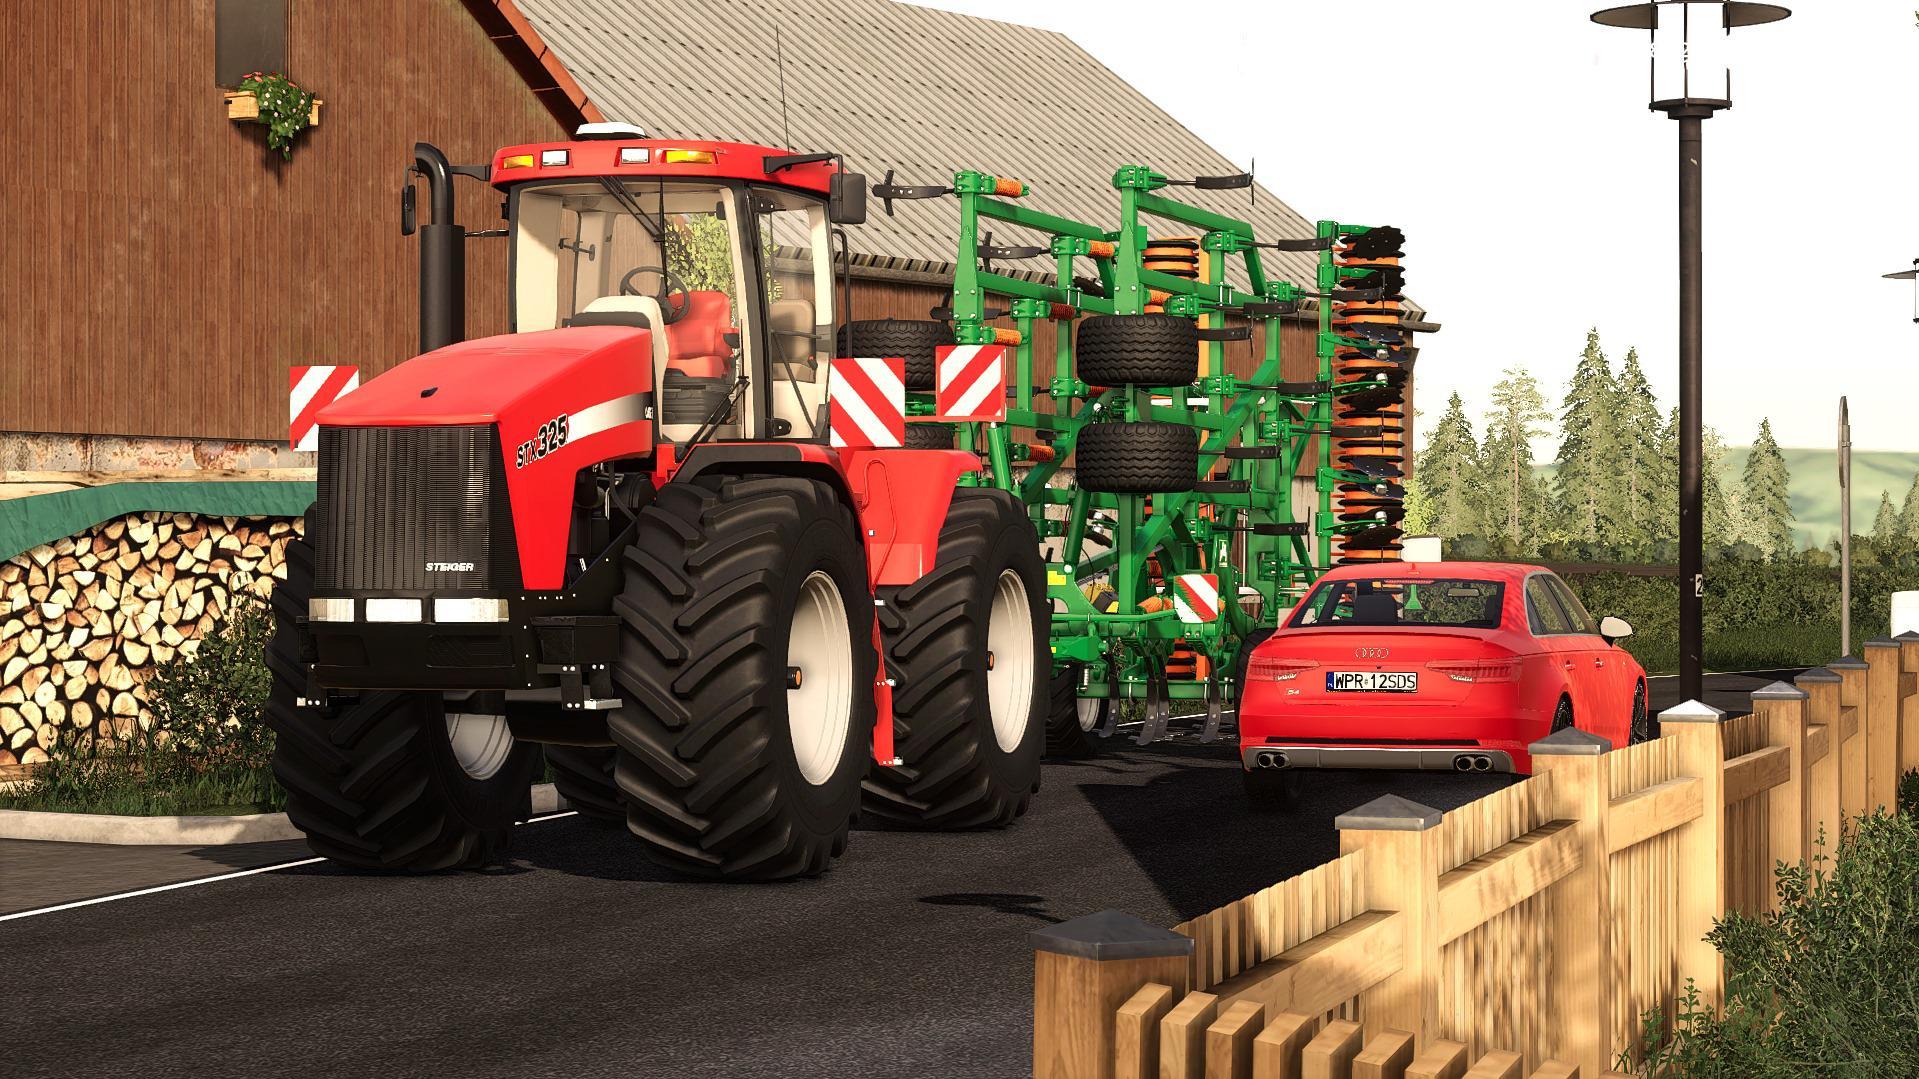 Case Ih StX Steiger Tractor V1.0.0.1